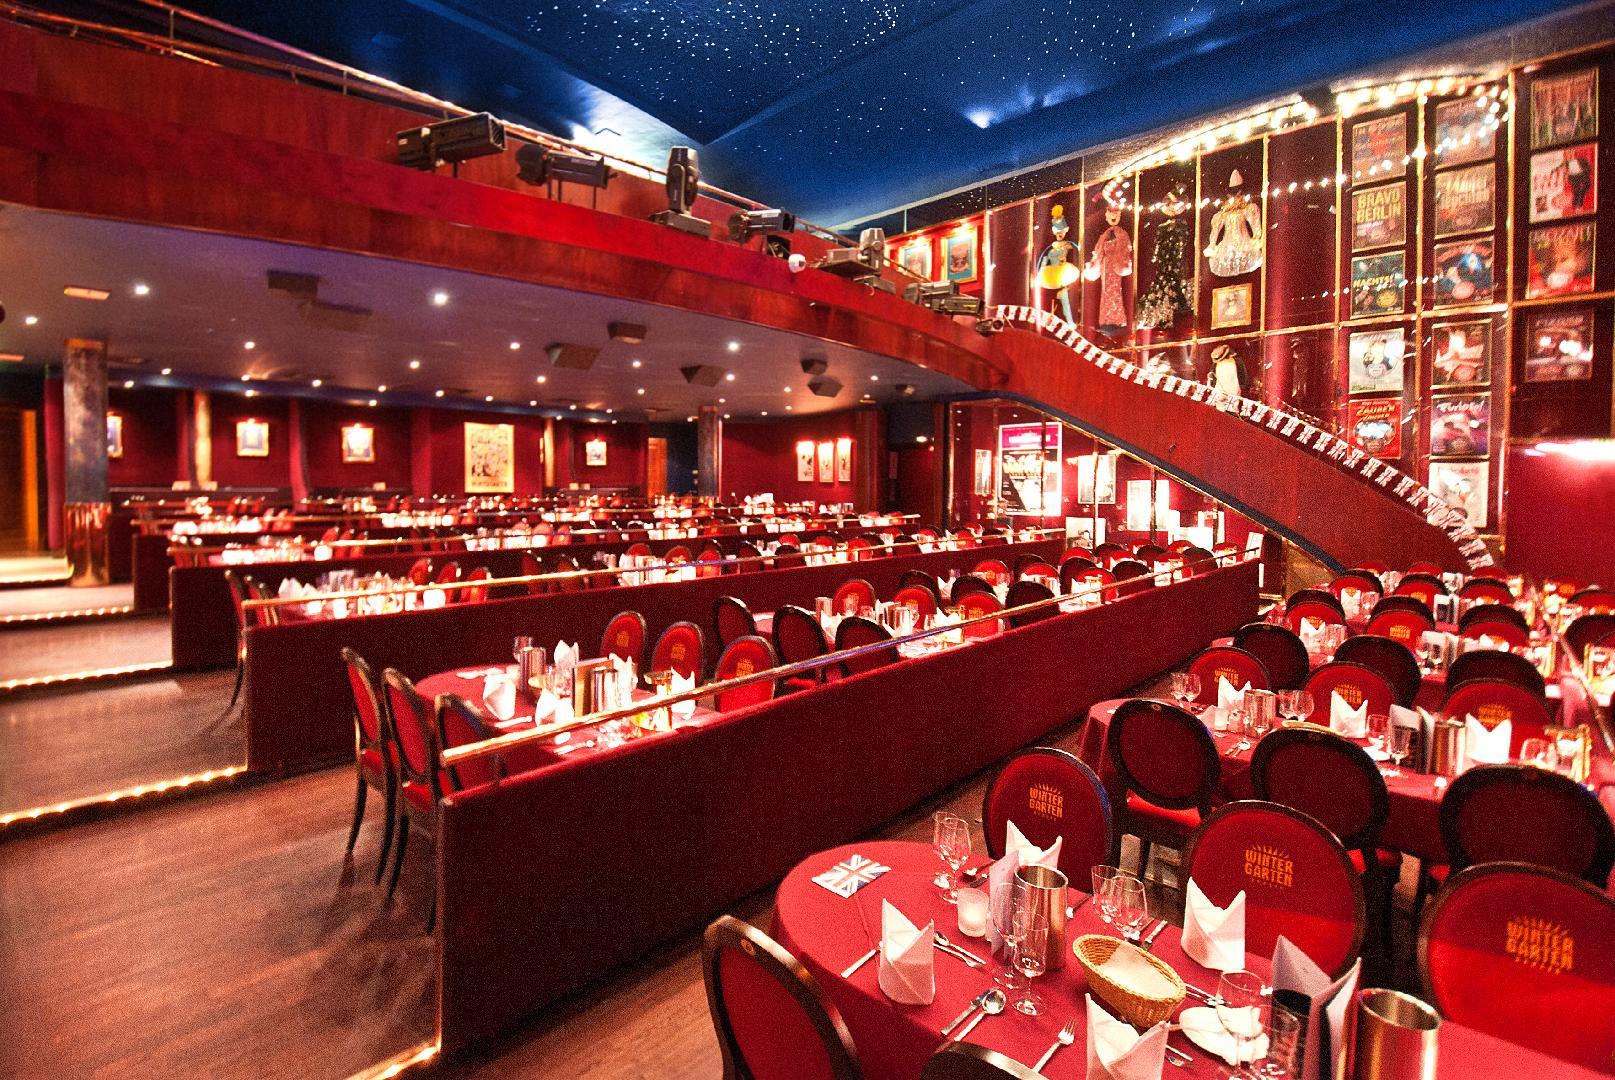 Wintergarten Berlin Club Restaurant Lounge Event